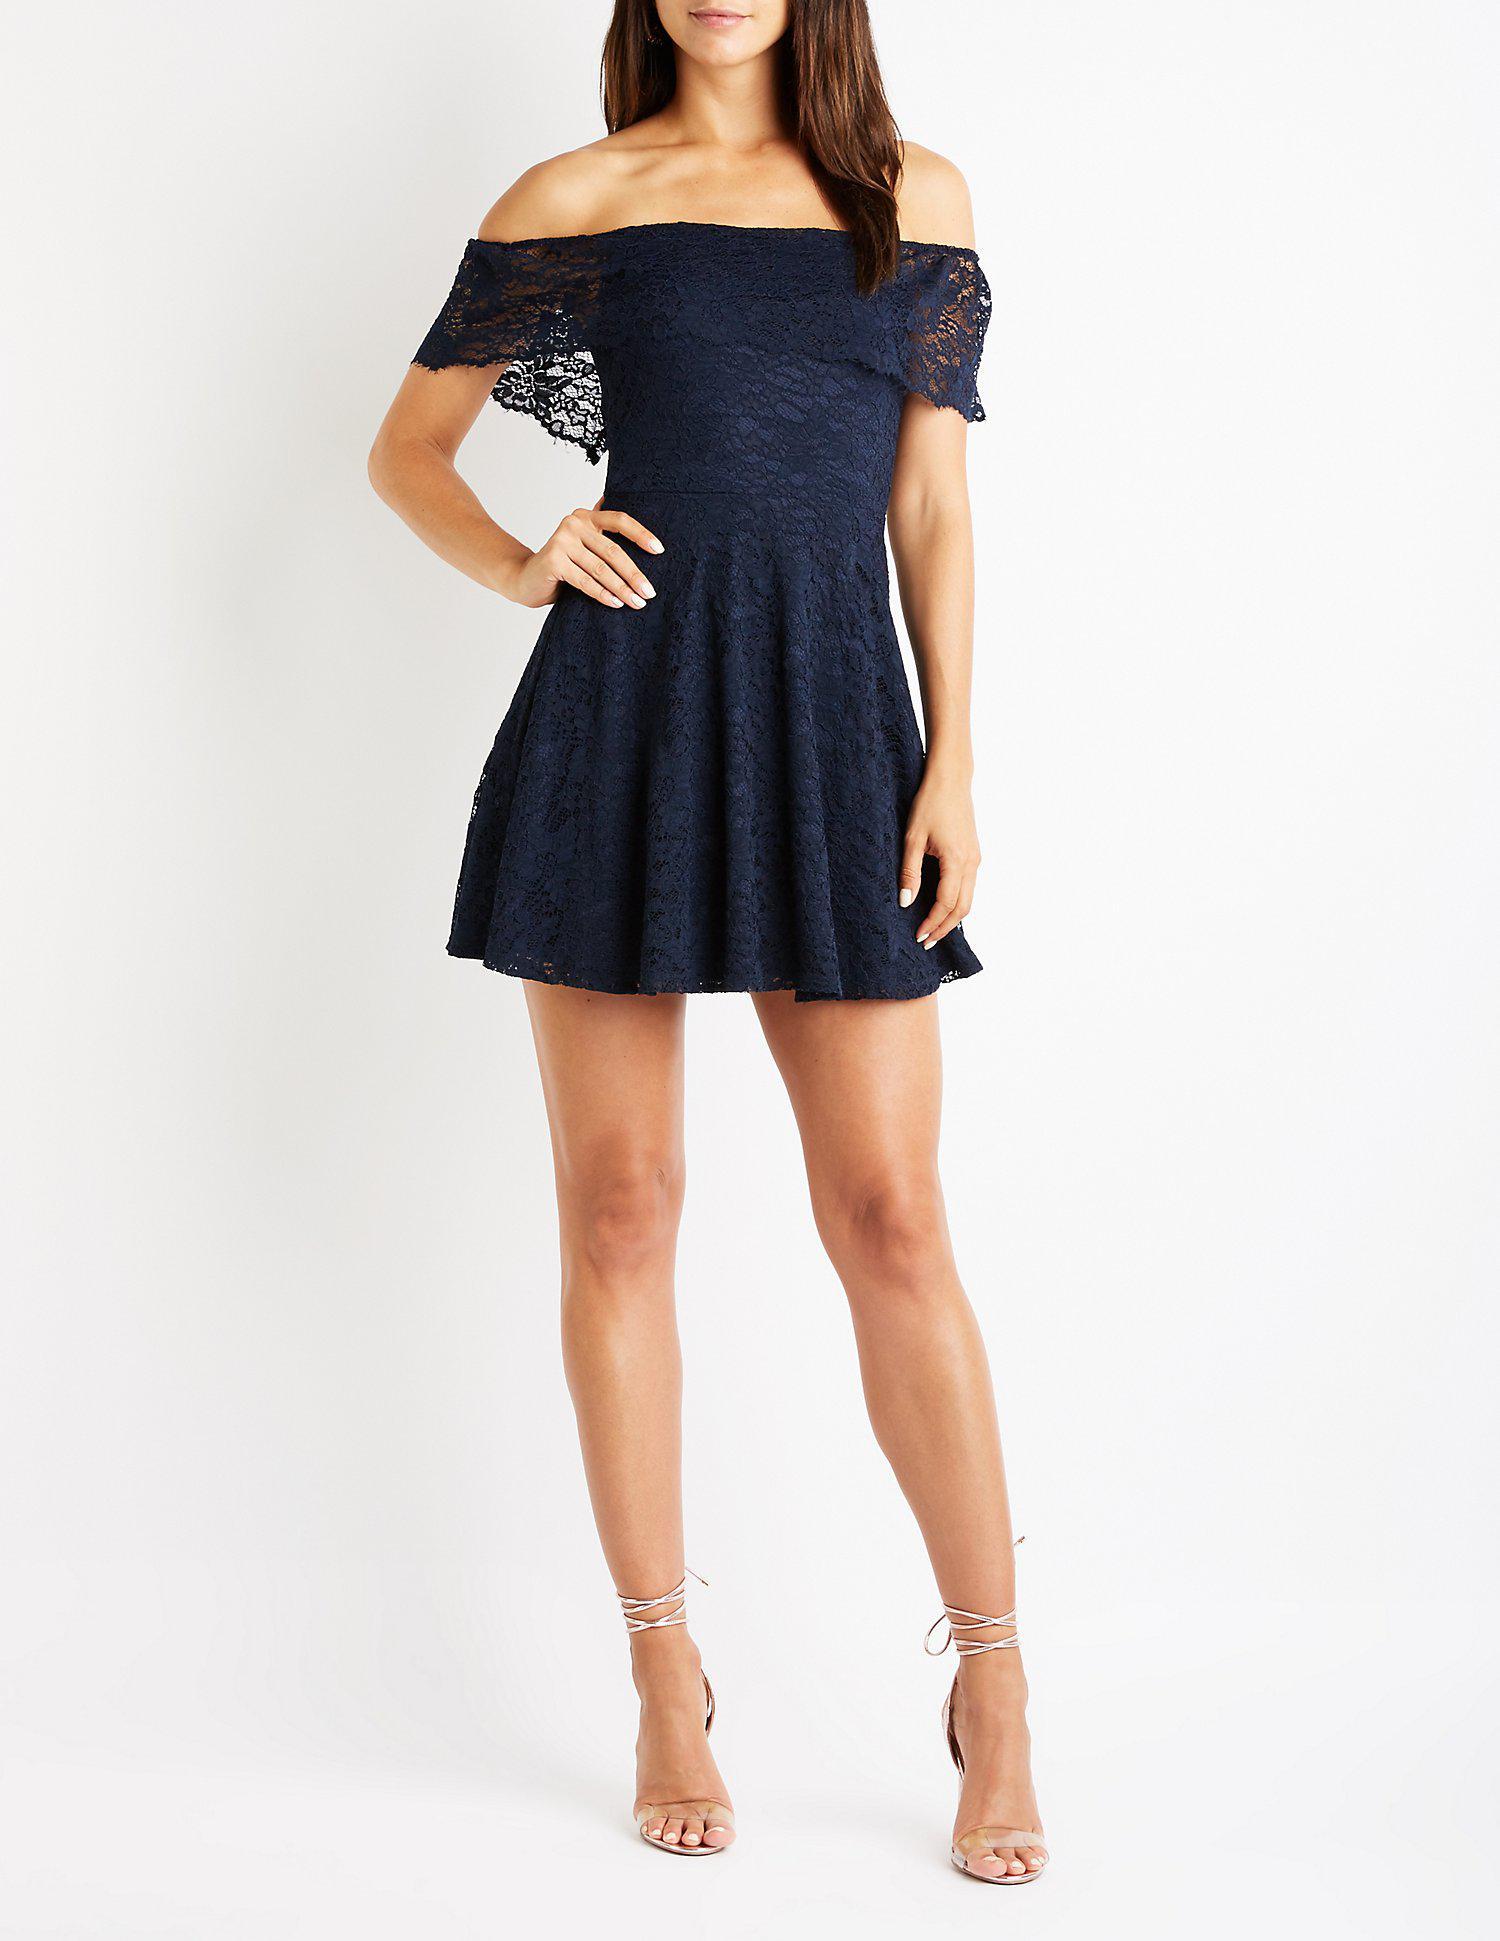 de76c36d473 Lyst - Charlotte Russe Lace Off The Shoulder Skater Dress in Blue